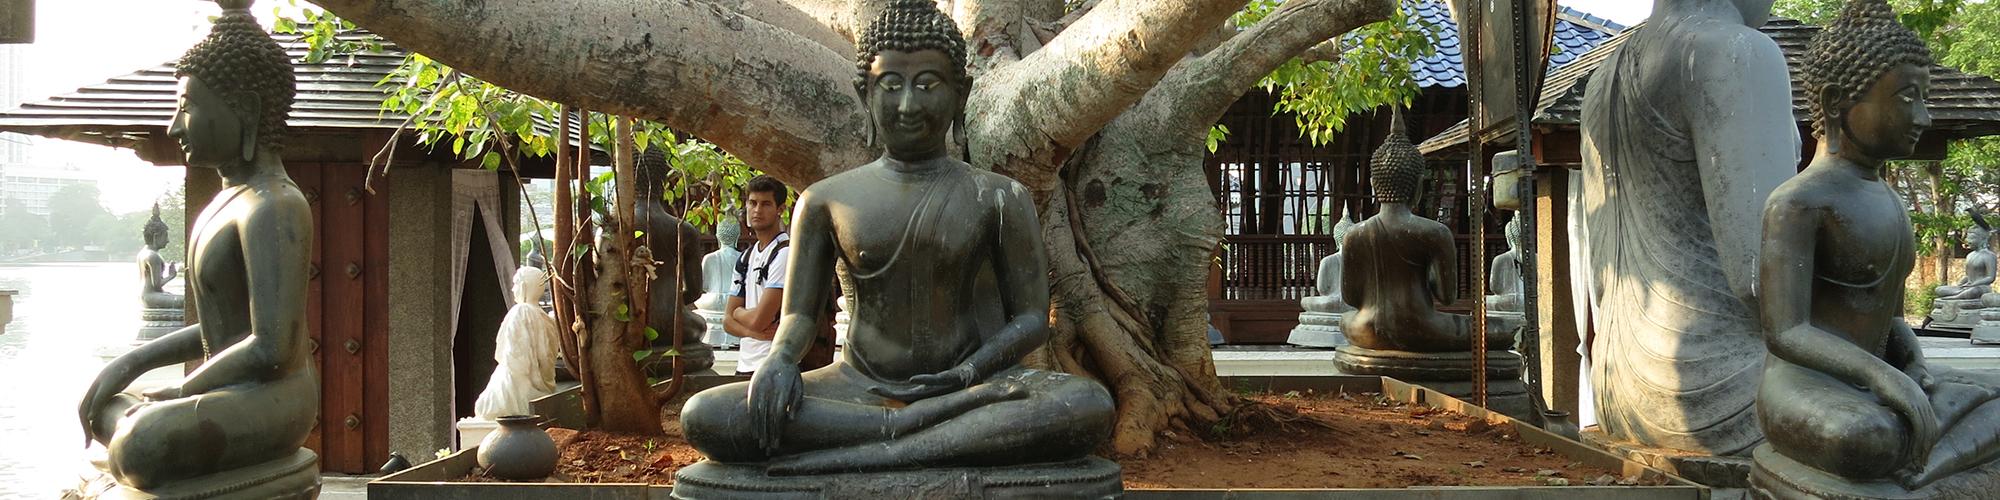 Buddha-statues-in-Sri-Lanka